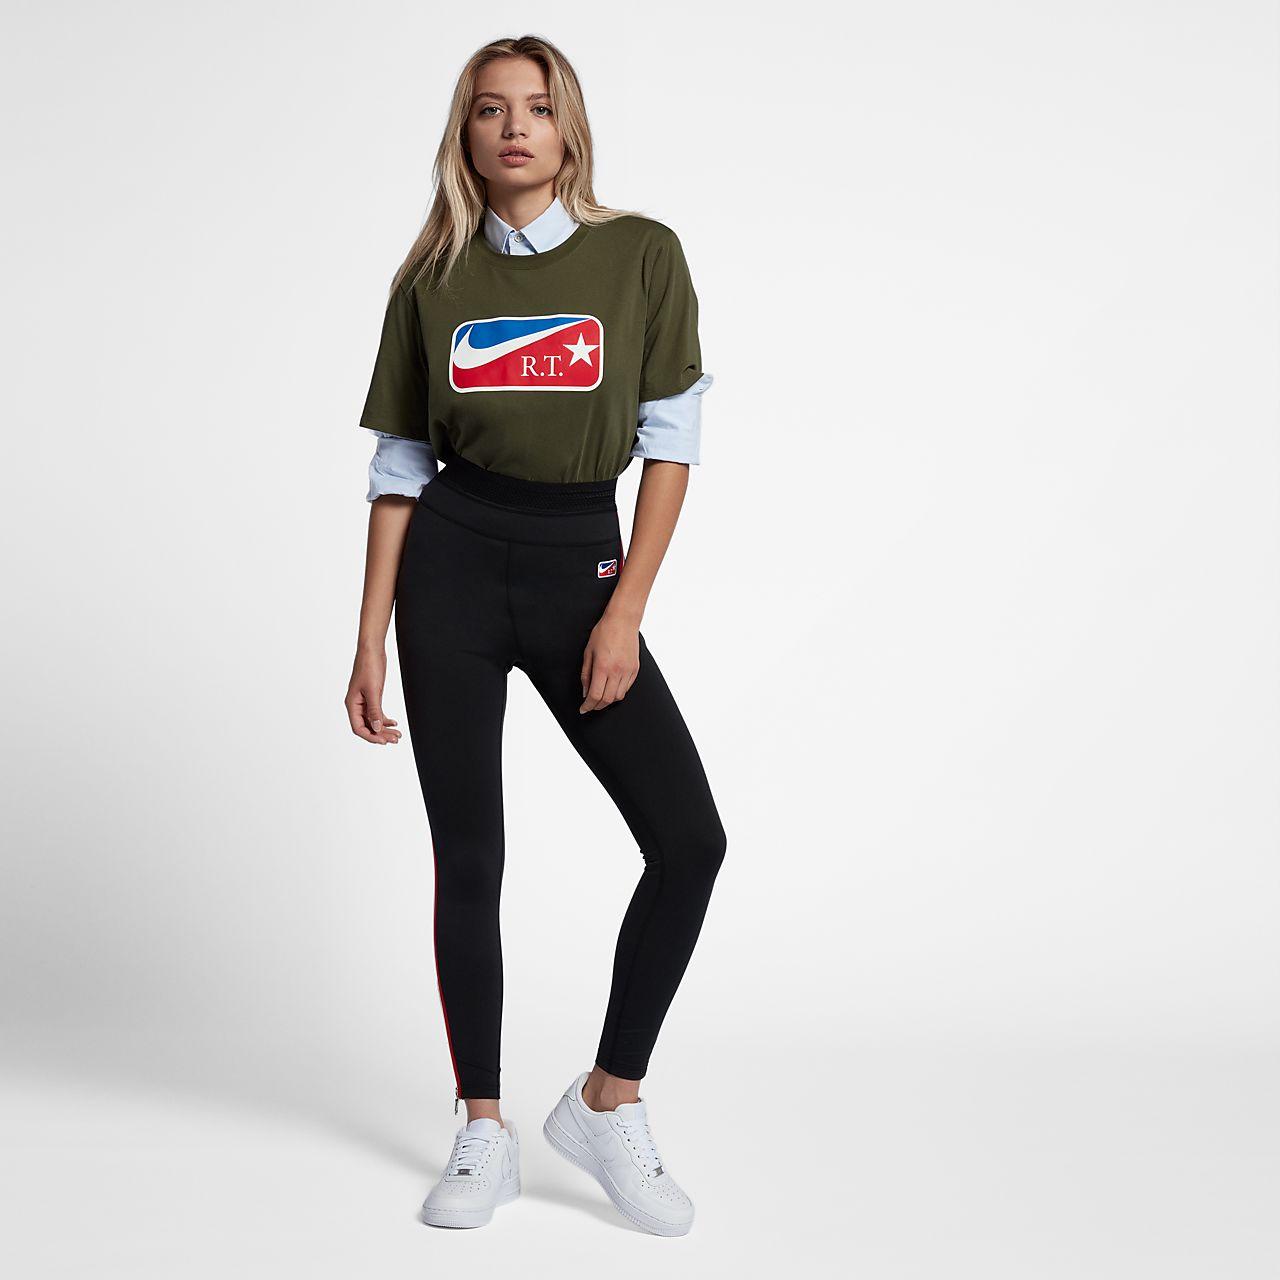 T Shirtsg 2hed9i Nike X Women's Rt xWrodBEQCe